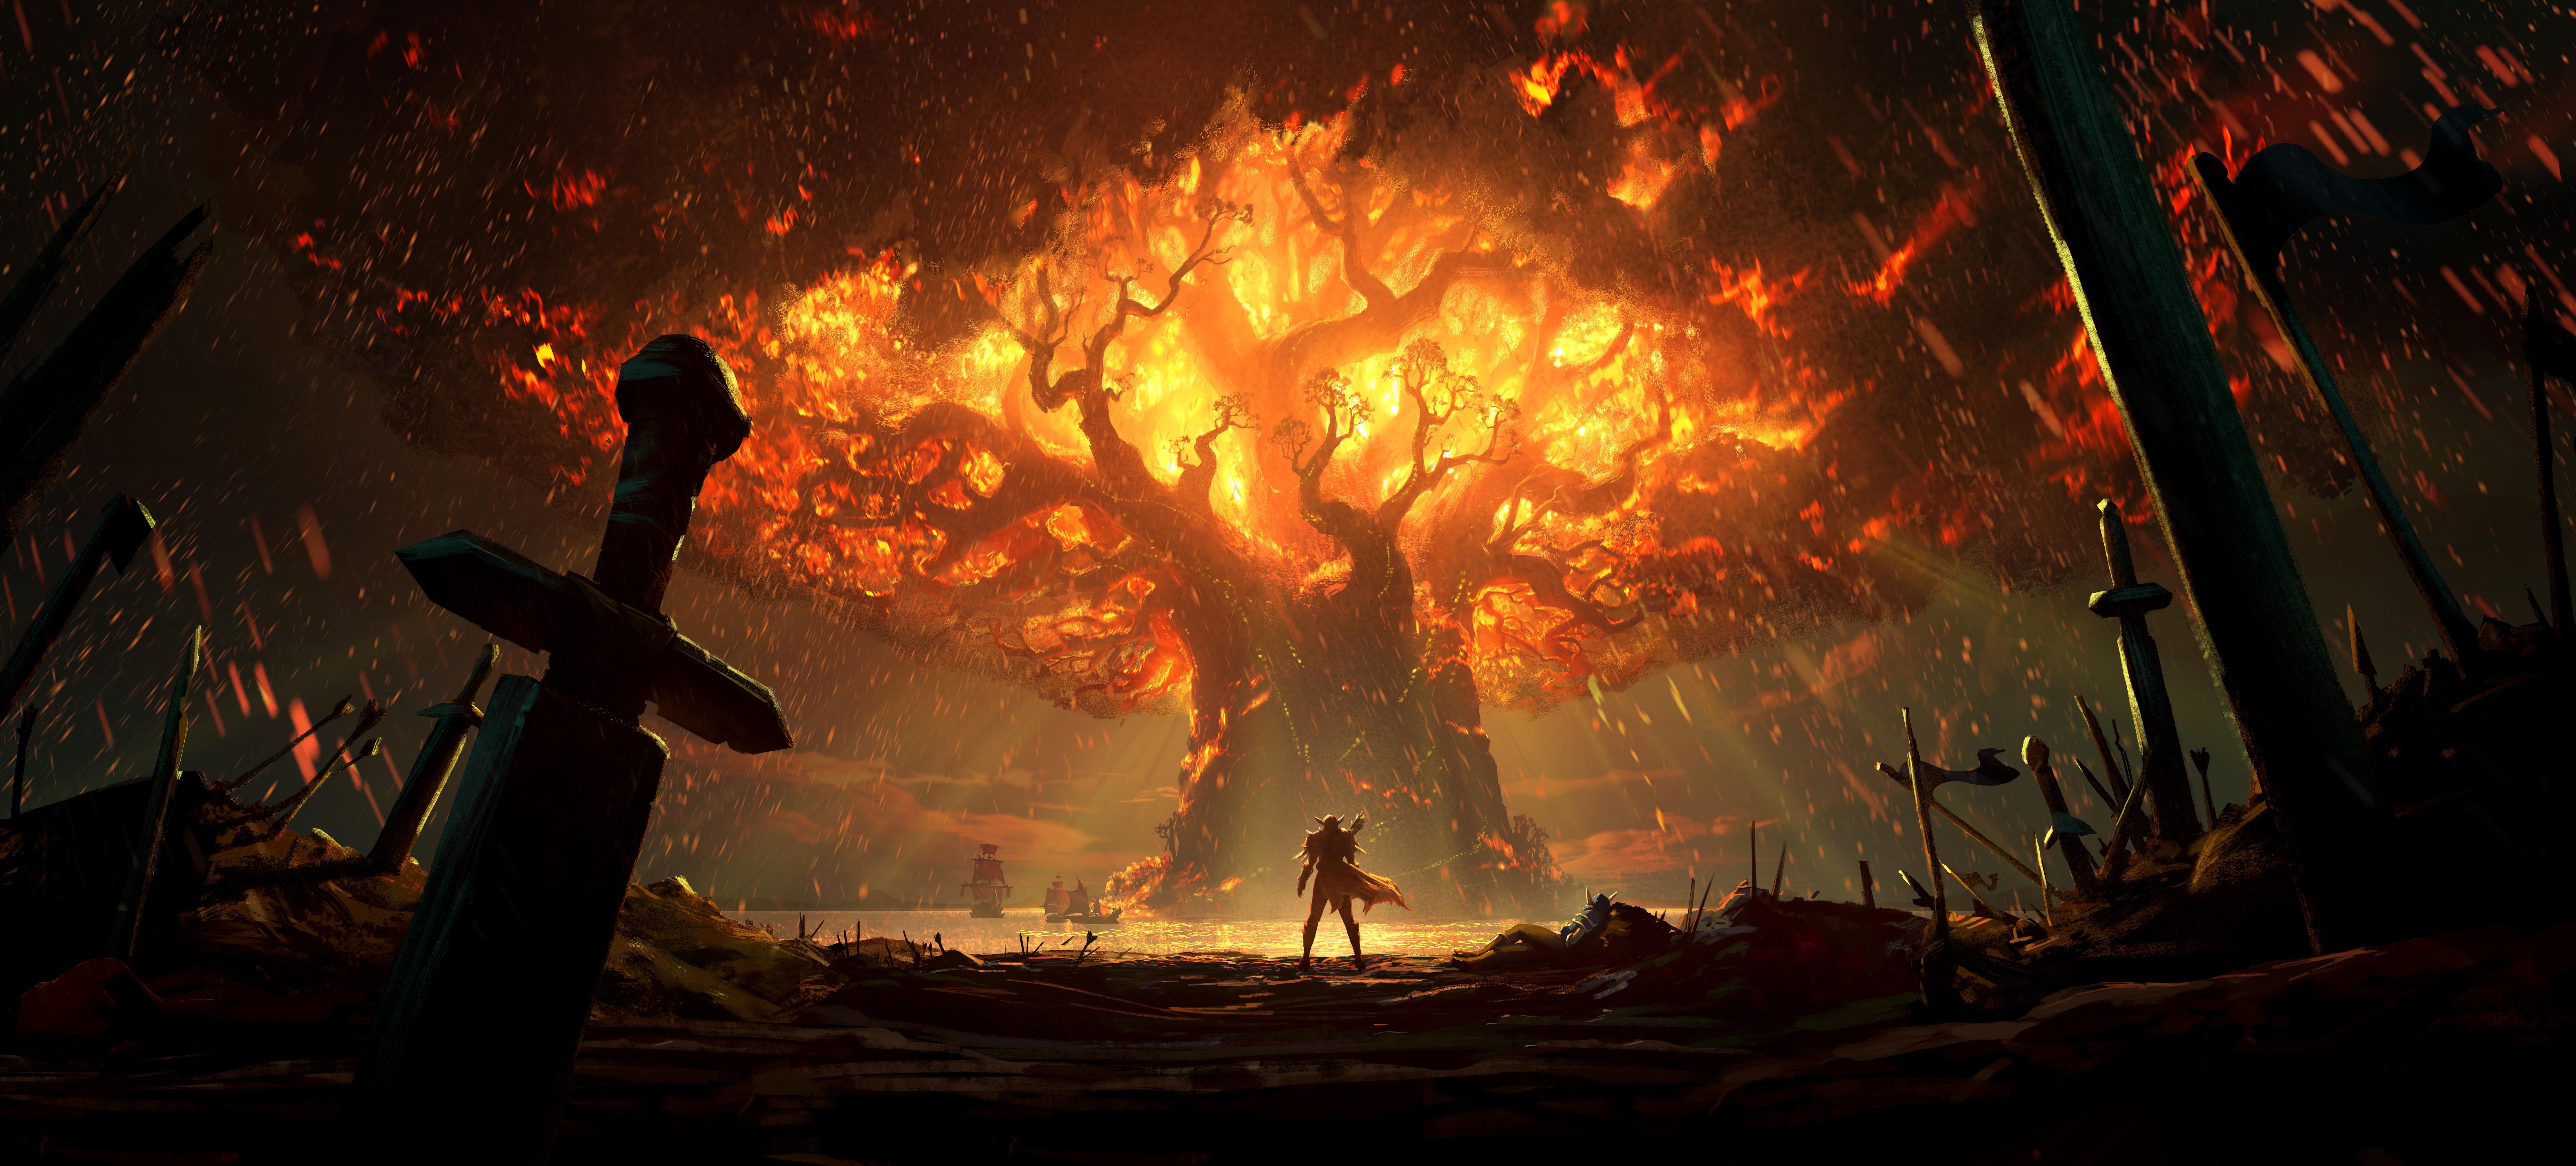 General 10000x4526 video games Warcraft Alliance Teldrassil fire sword trees World of Warcraft elven horde sailing ship digital art artwork landscape battle Blizzard Entertainment fantasy art DubstepGutter